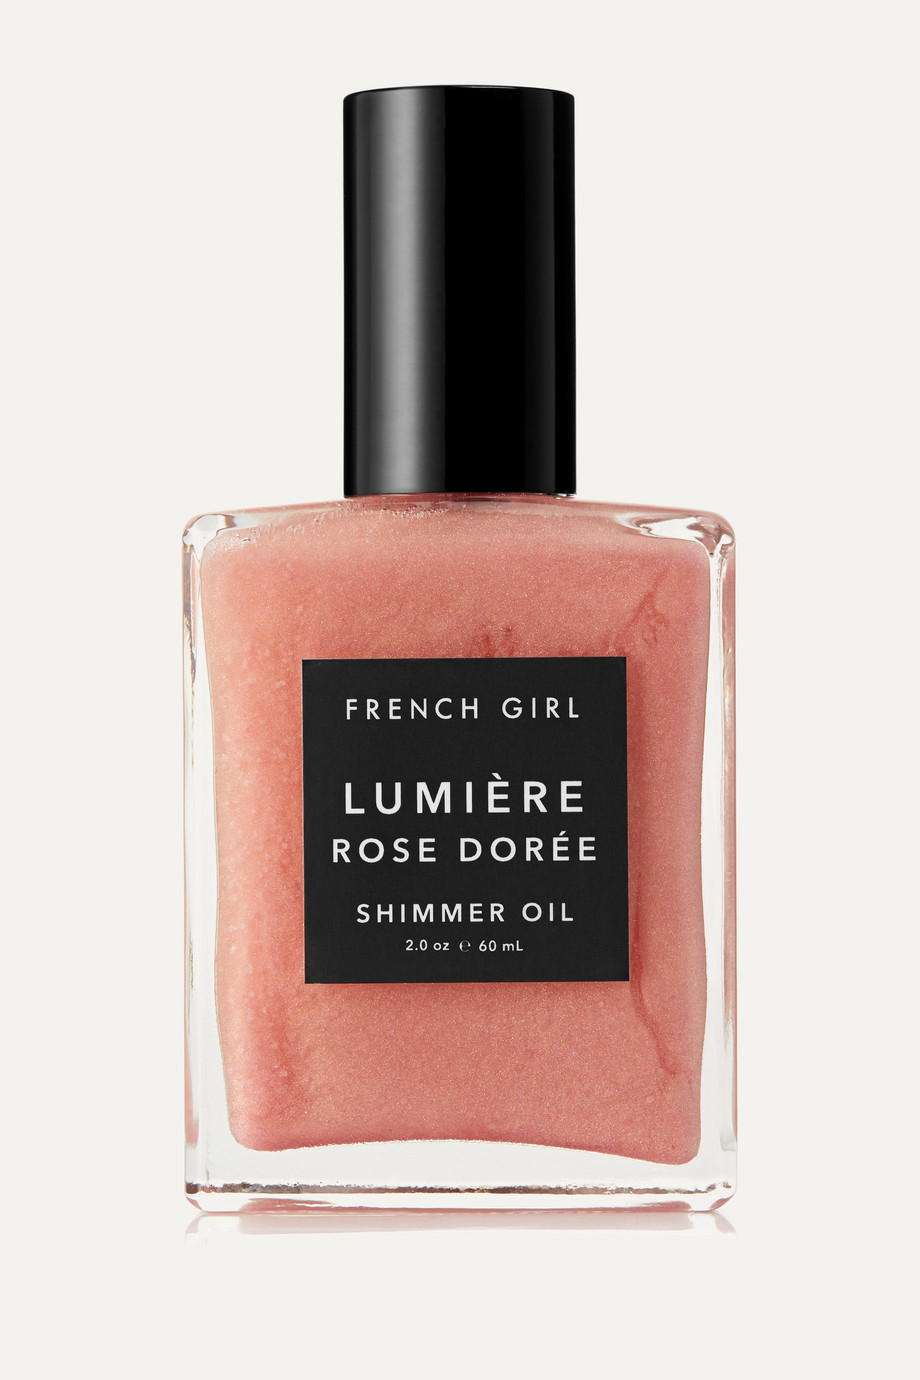 French Girl Organics Lumière Rose Dorée Shimmer Oil, 60ml